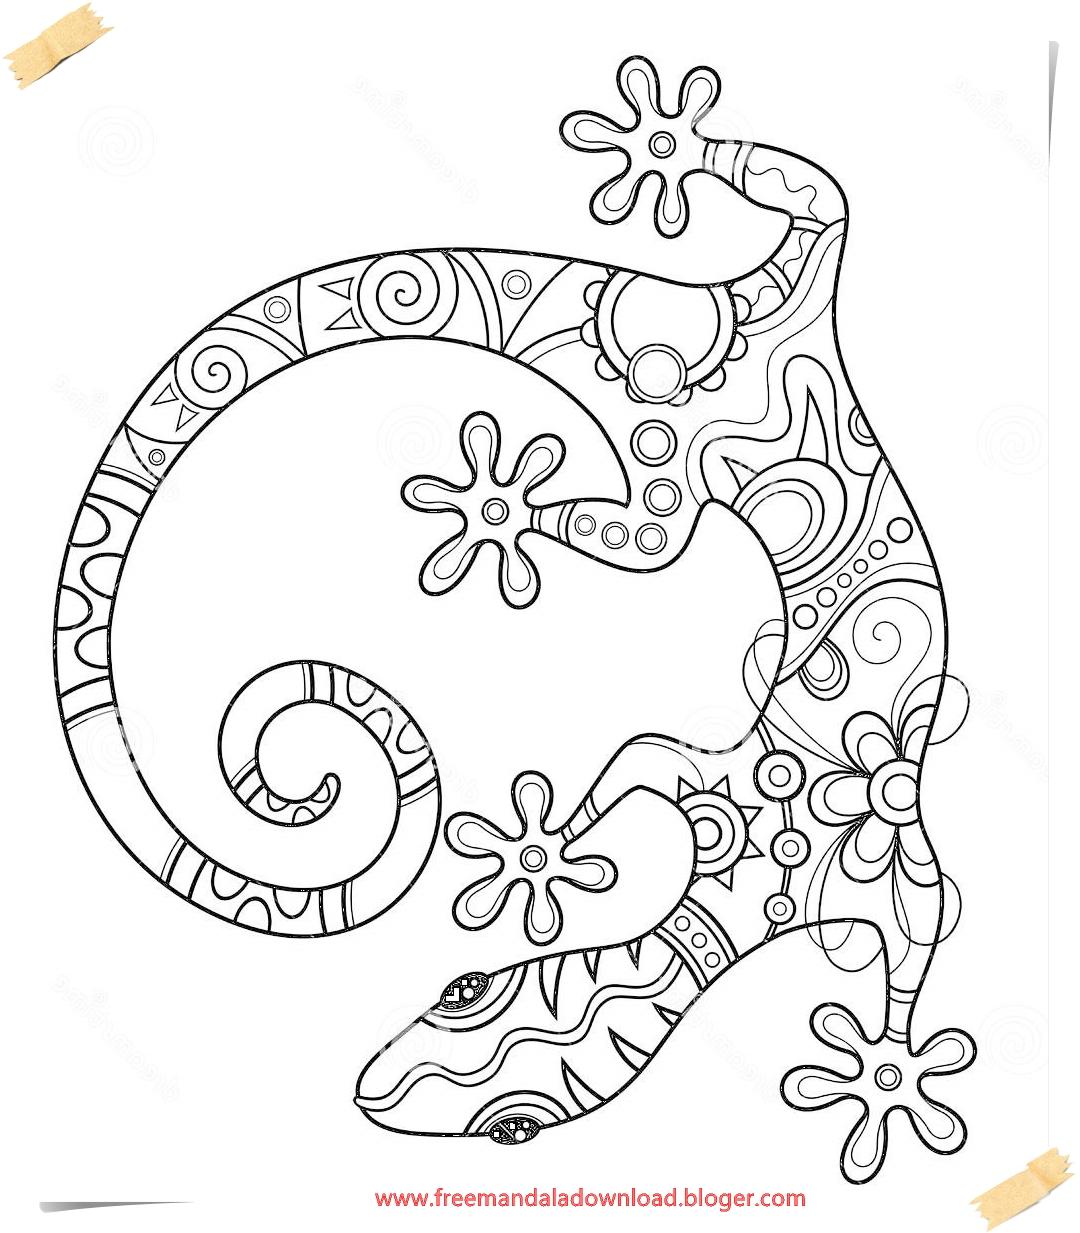 lizard mandala malvorlagen lizard mandala coloring page free mandala. Black Bedroom Furniture Sets. Home Design Ideas